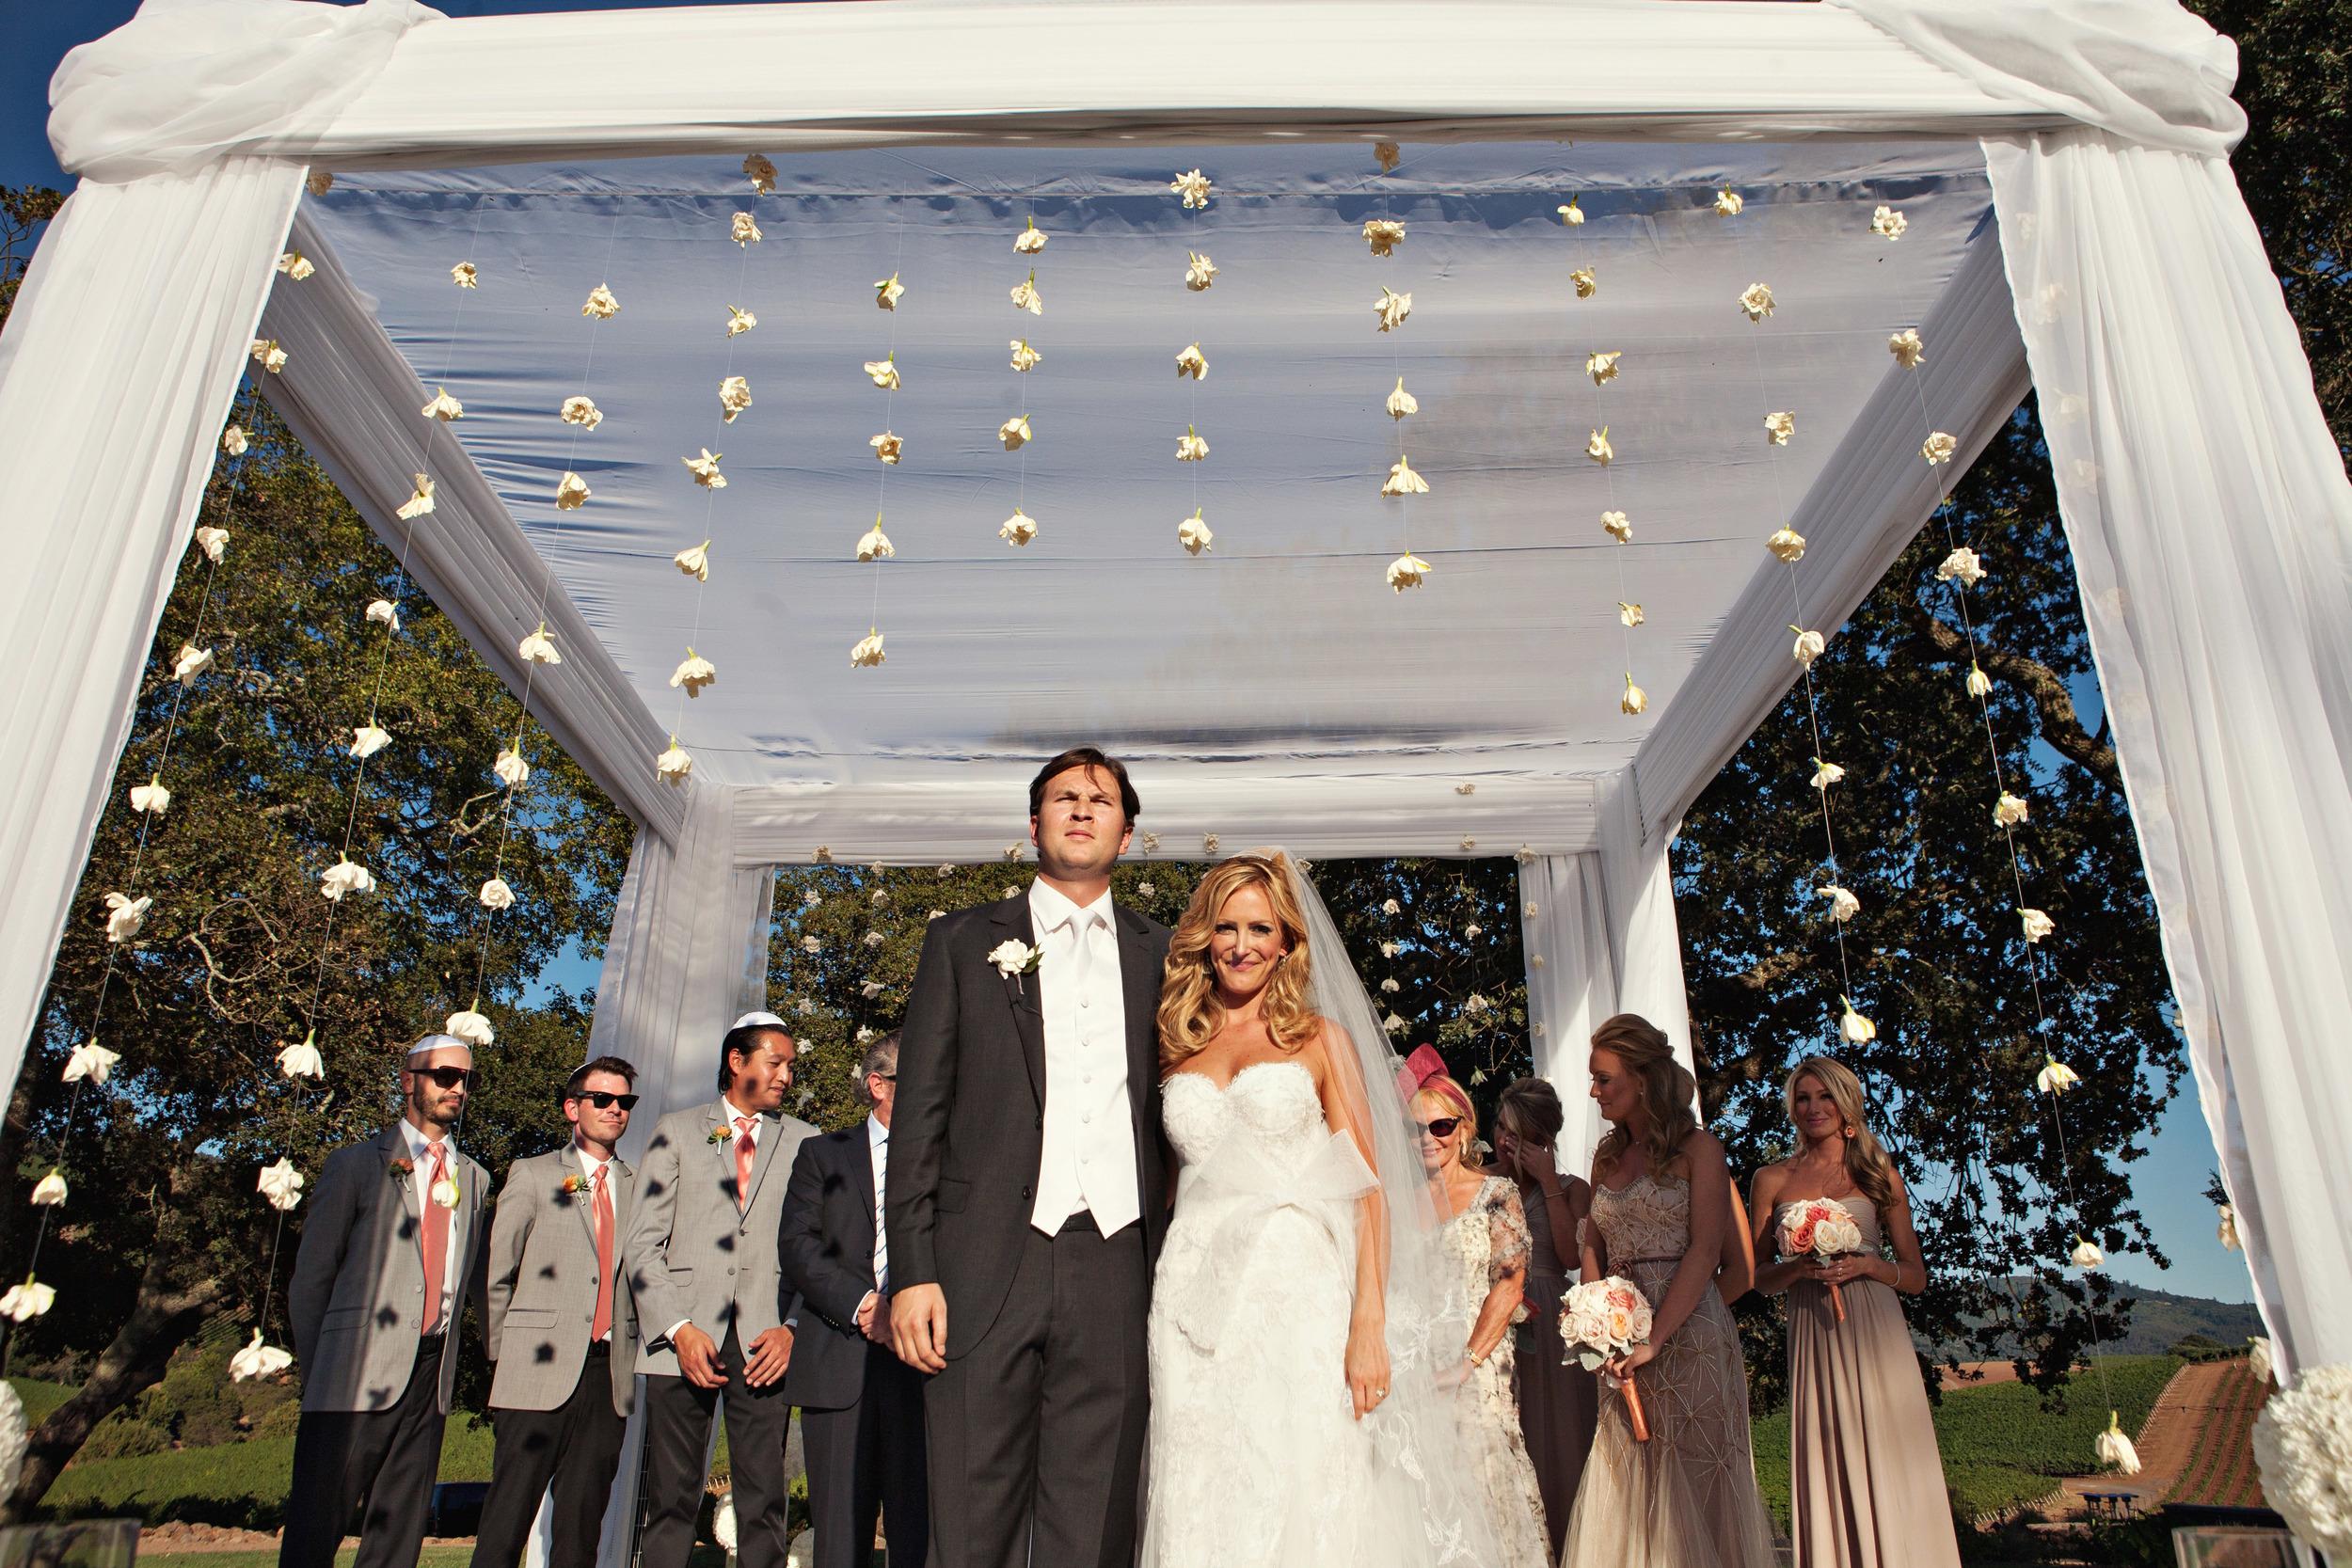 09. hanging flowers, gorgeous chuppah, hanging gardenias, vineyard ceremony, napa wedding.jpg